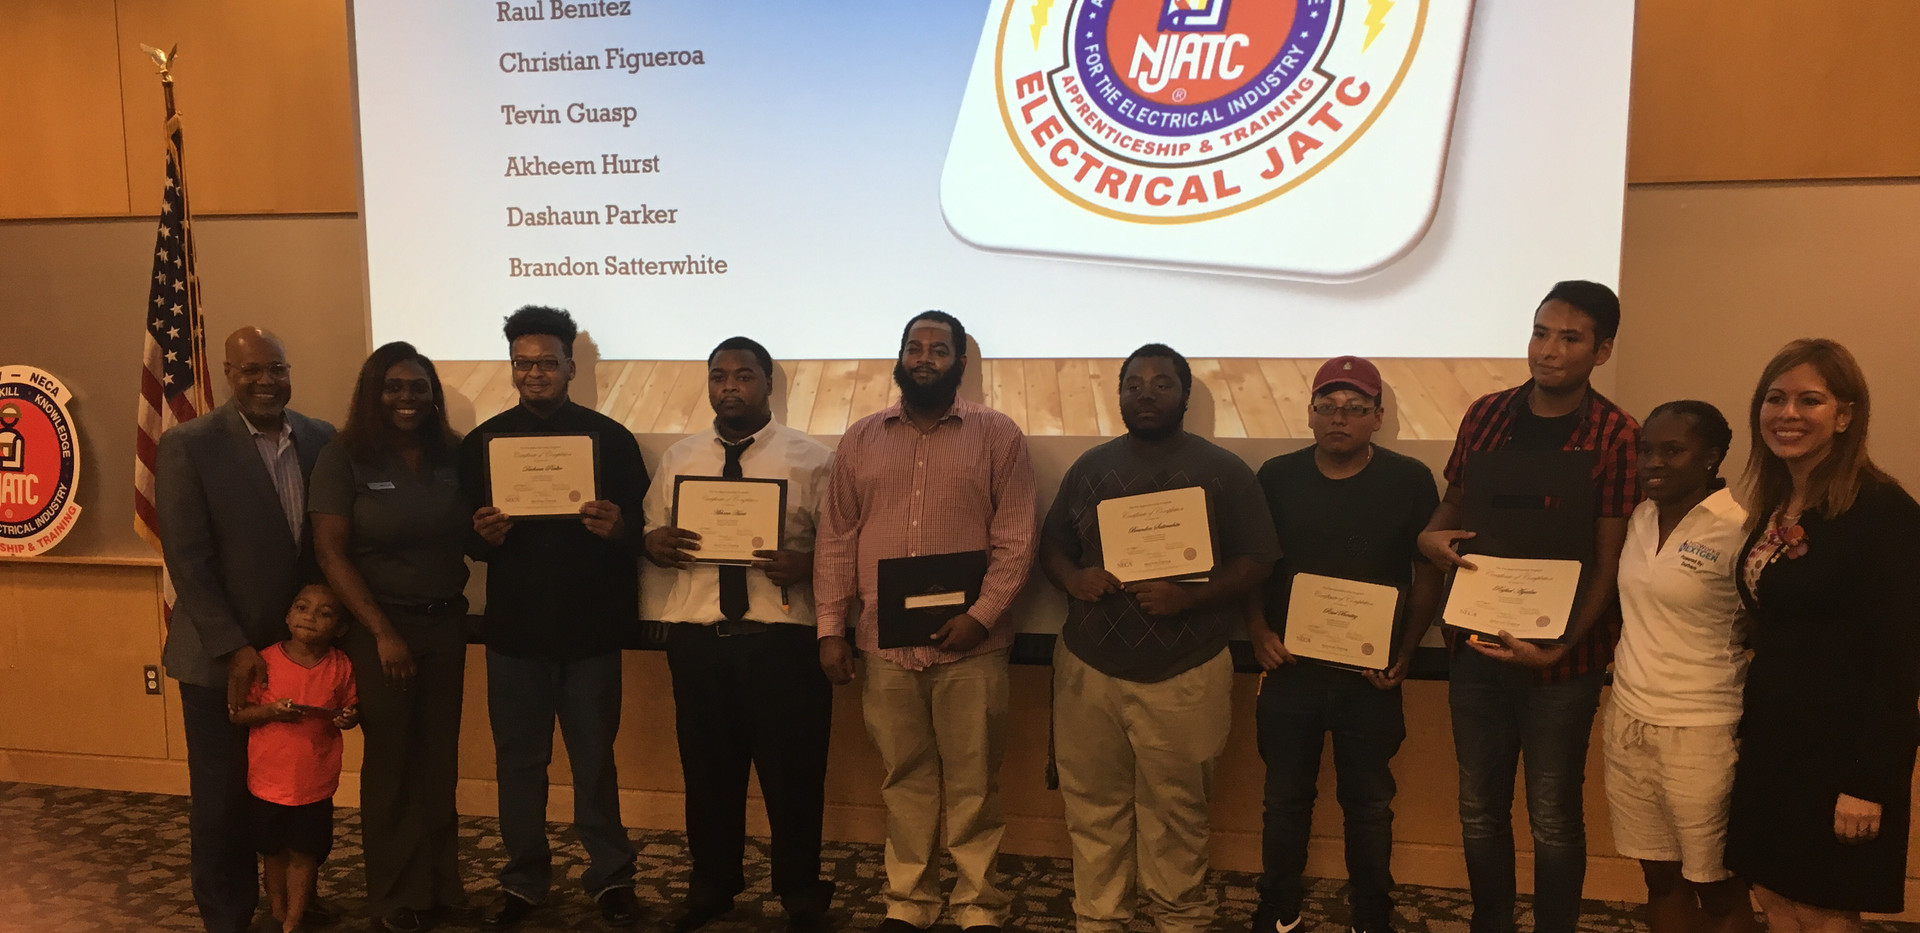 Raleigh Durham JATC Electricial Pre-Apprenticeship Graduation